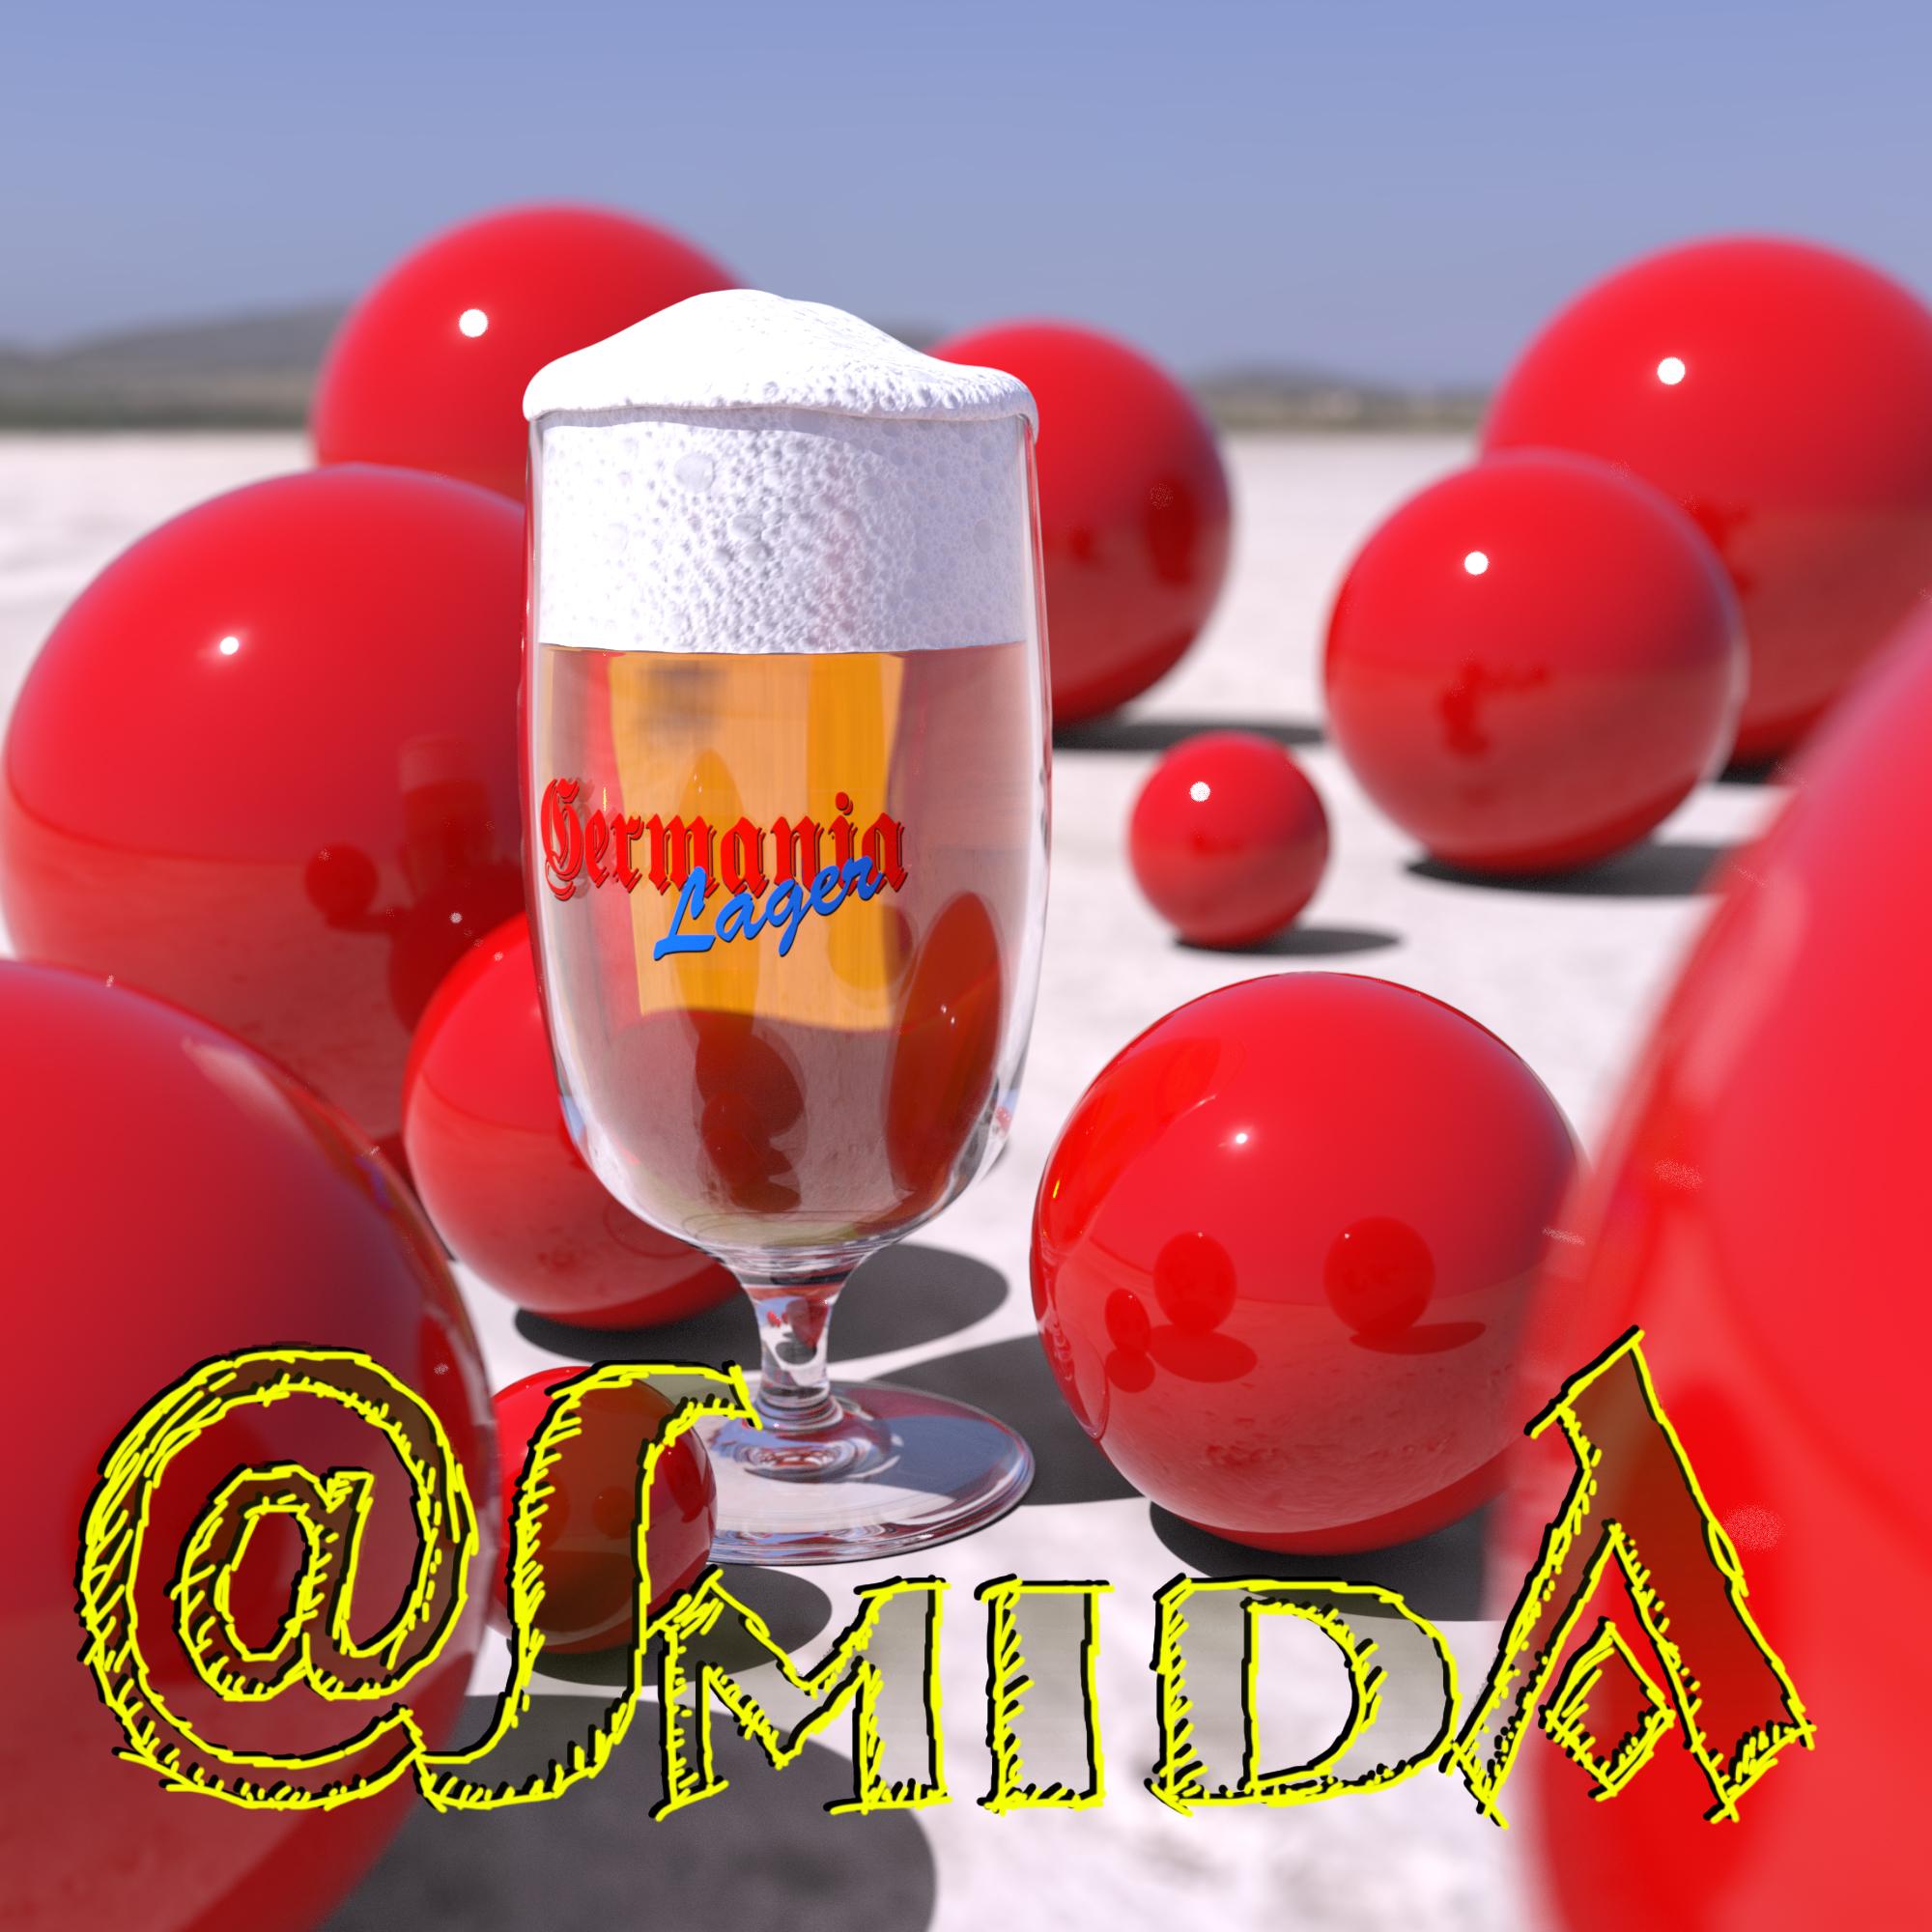 Freebie - SmidA - Glass of Beer